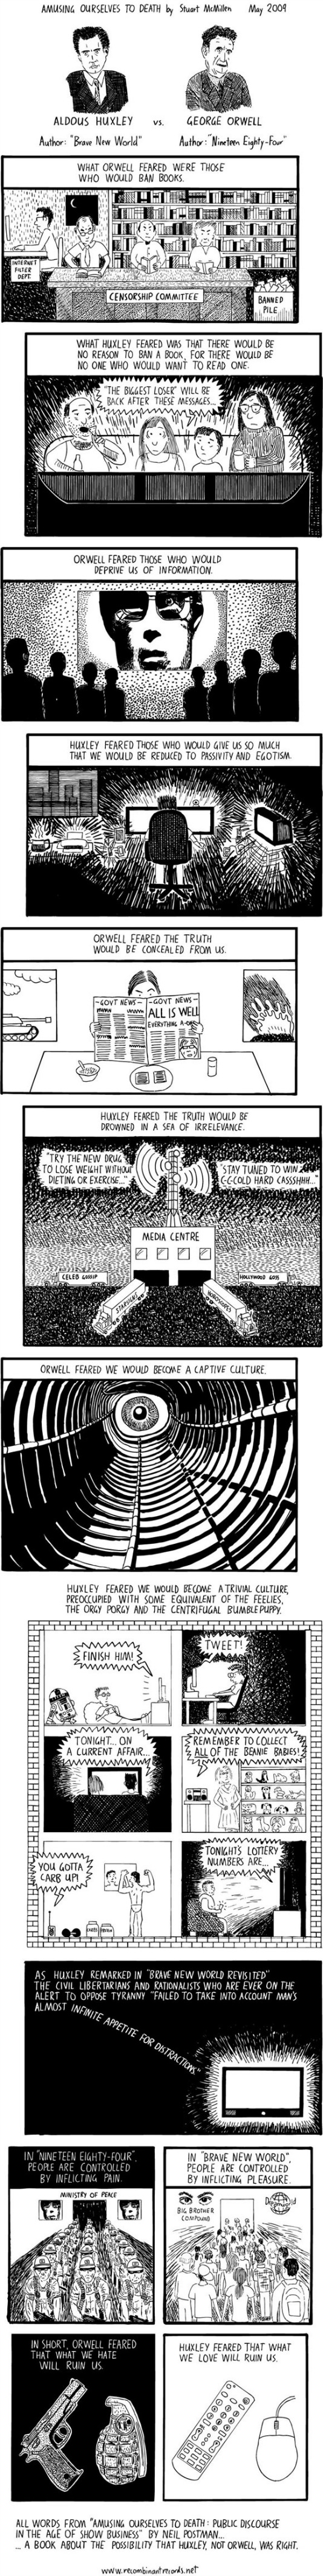 Orwellversushuxley.jpg